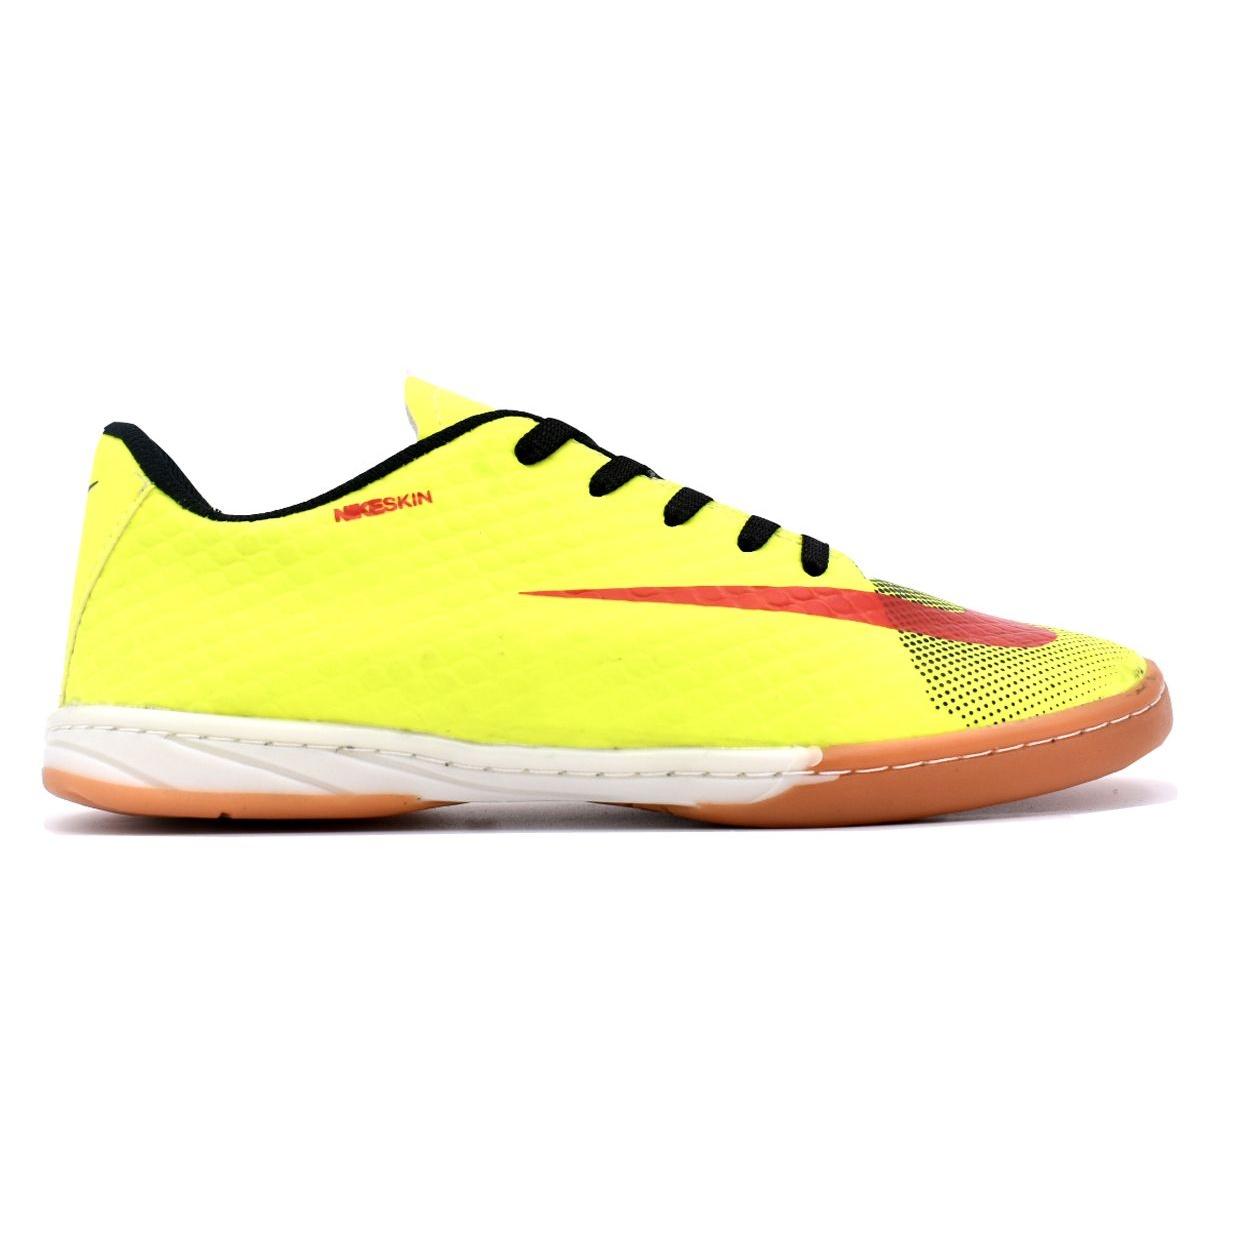 قیمت خرید کفش فوتسال مردانه کد 1008 اورجینال